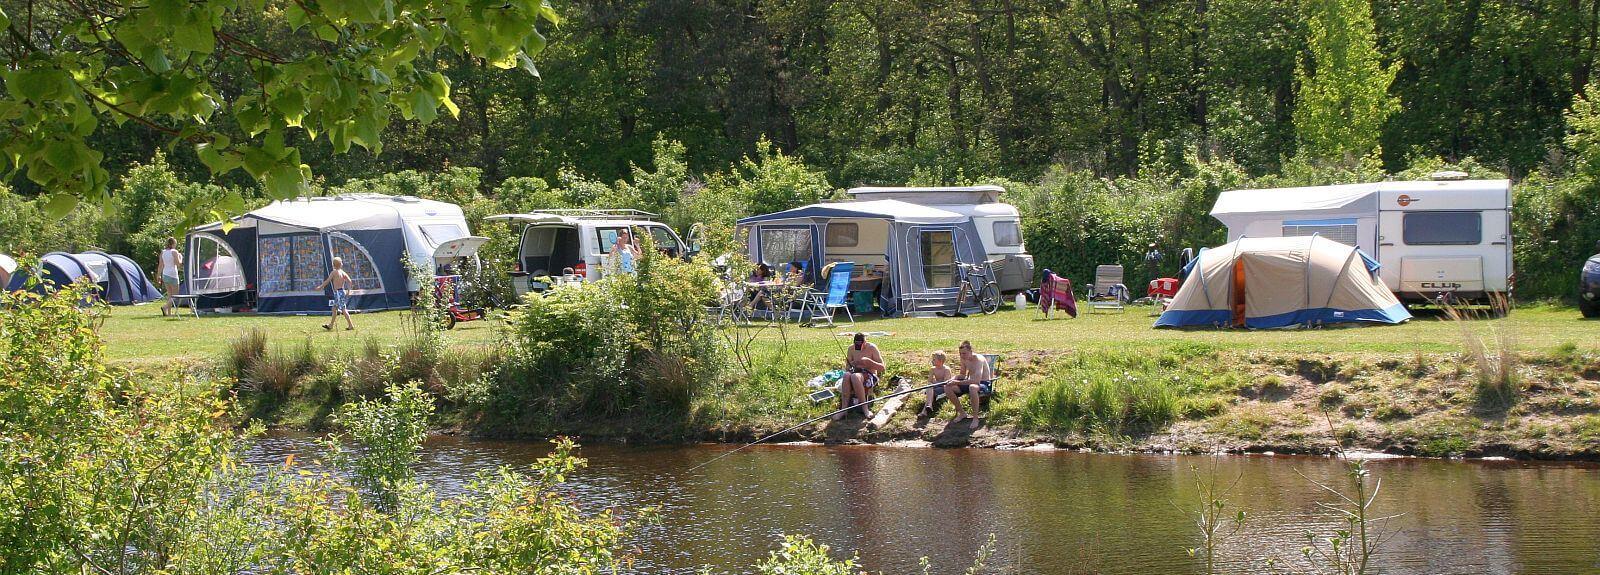 Camping met visvijver - Camping met visvijver